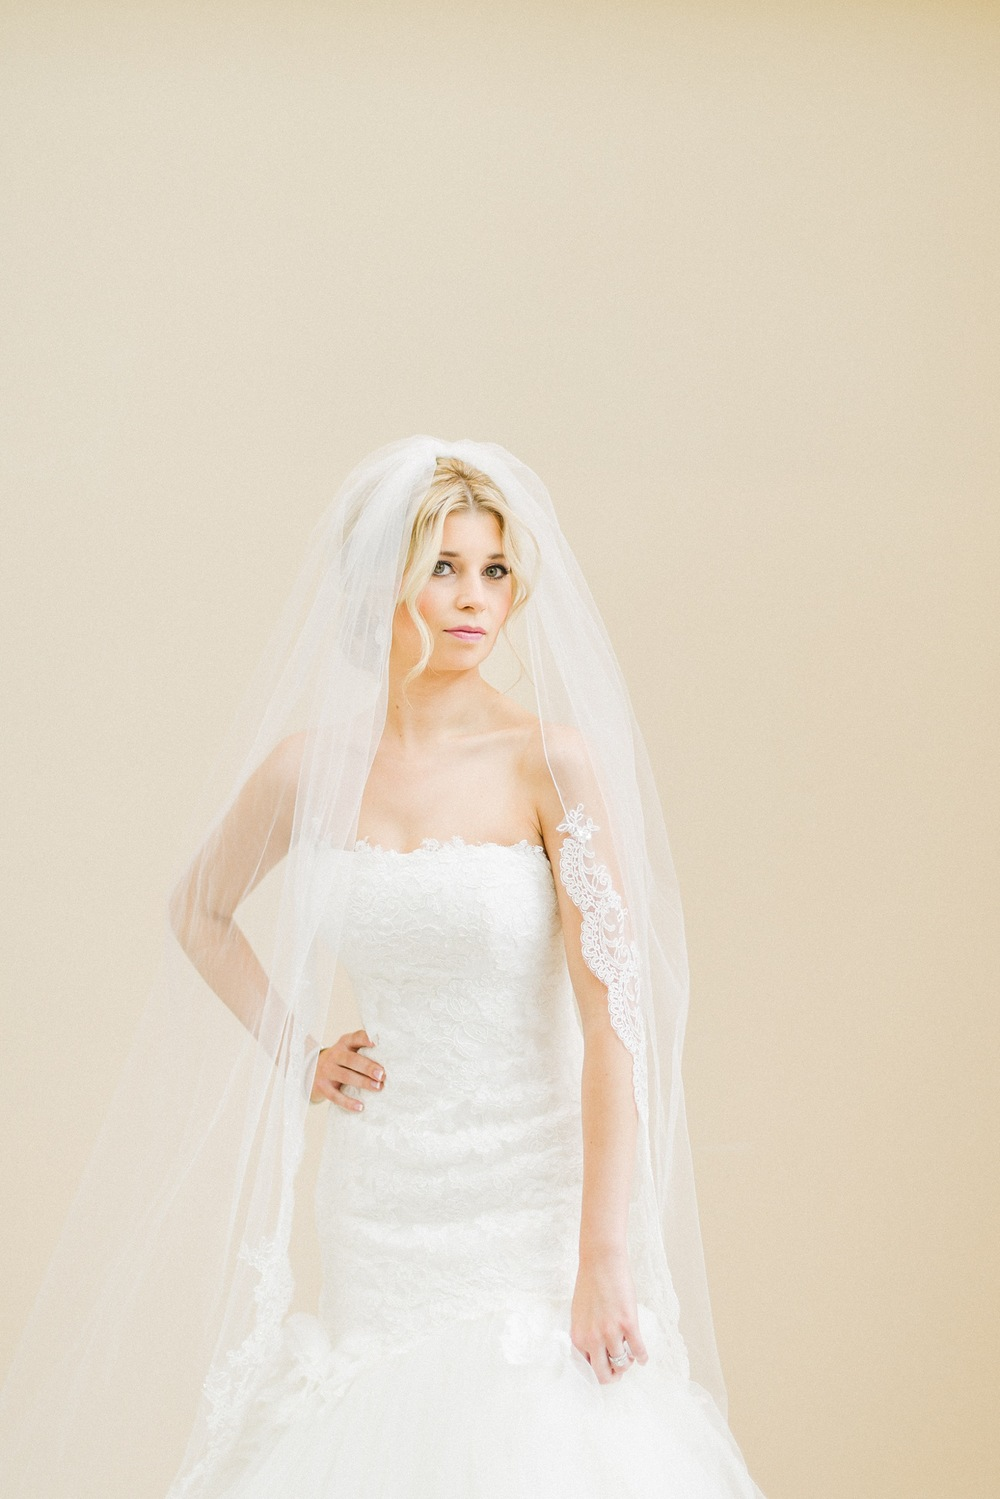 rodrigueswedding-33.jpg